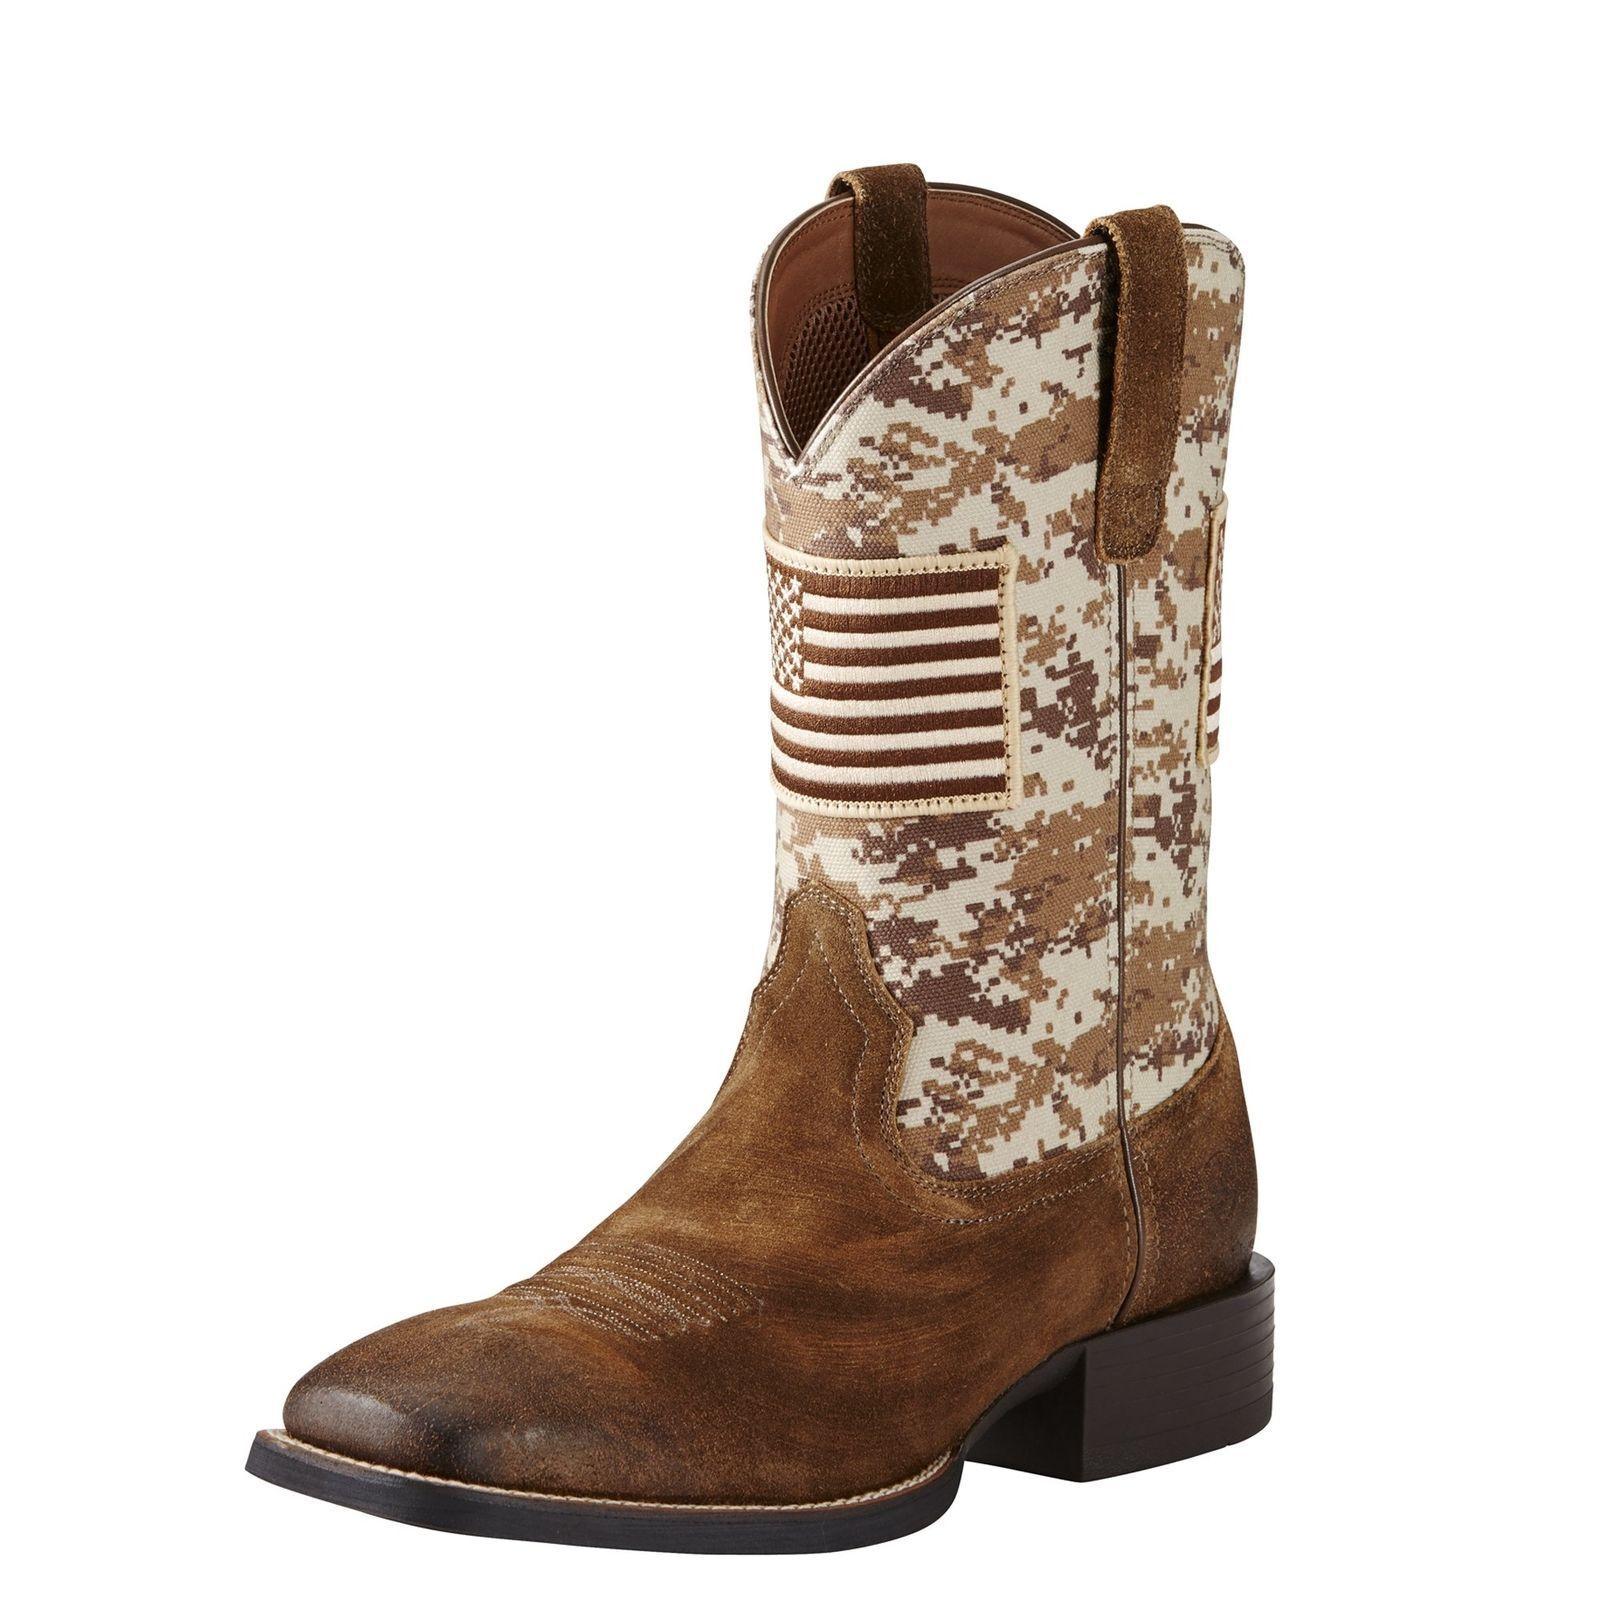 Ariat Men's Brown Camo Sport Patriot Square Toe Boots 10019959